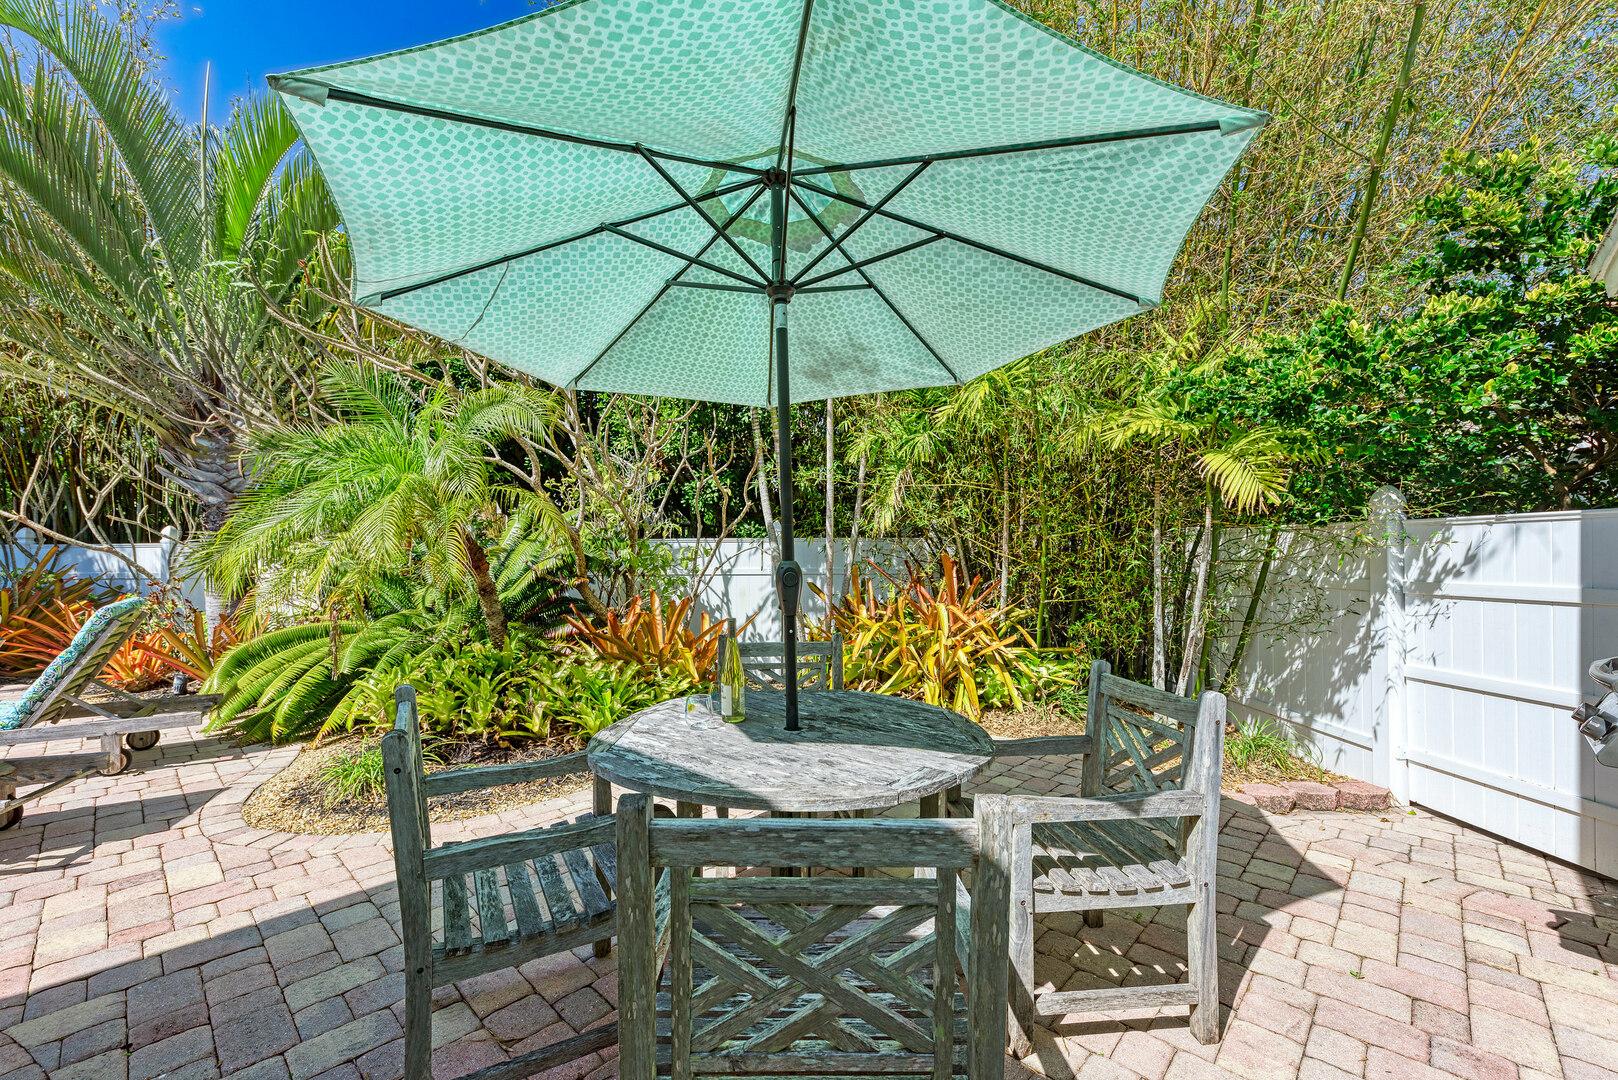 Mermaids & Manatees outdoor patio area